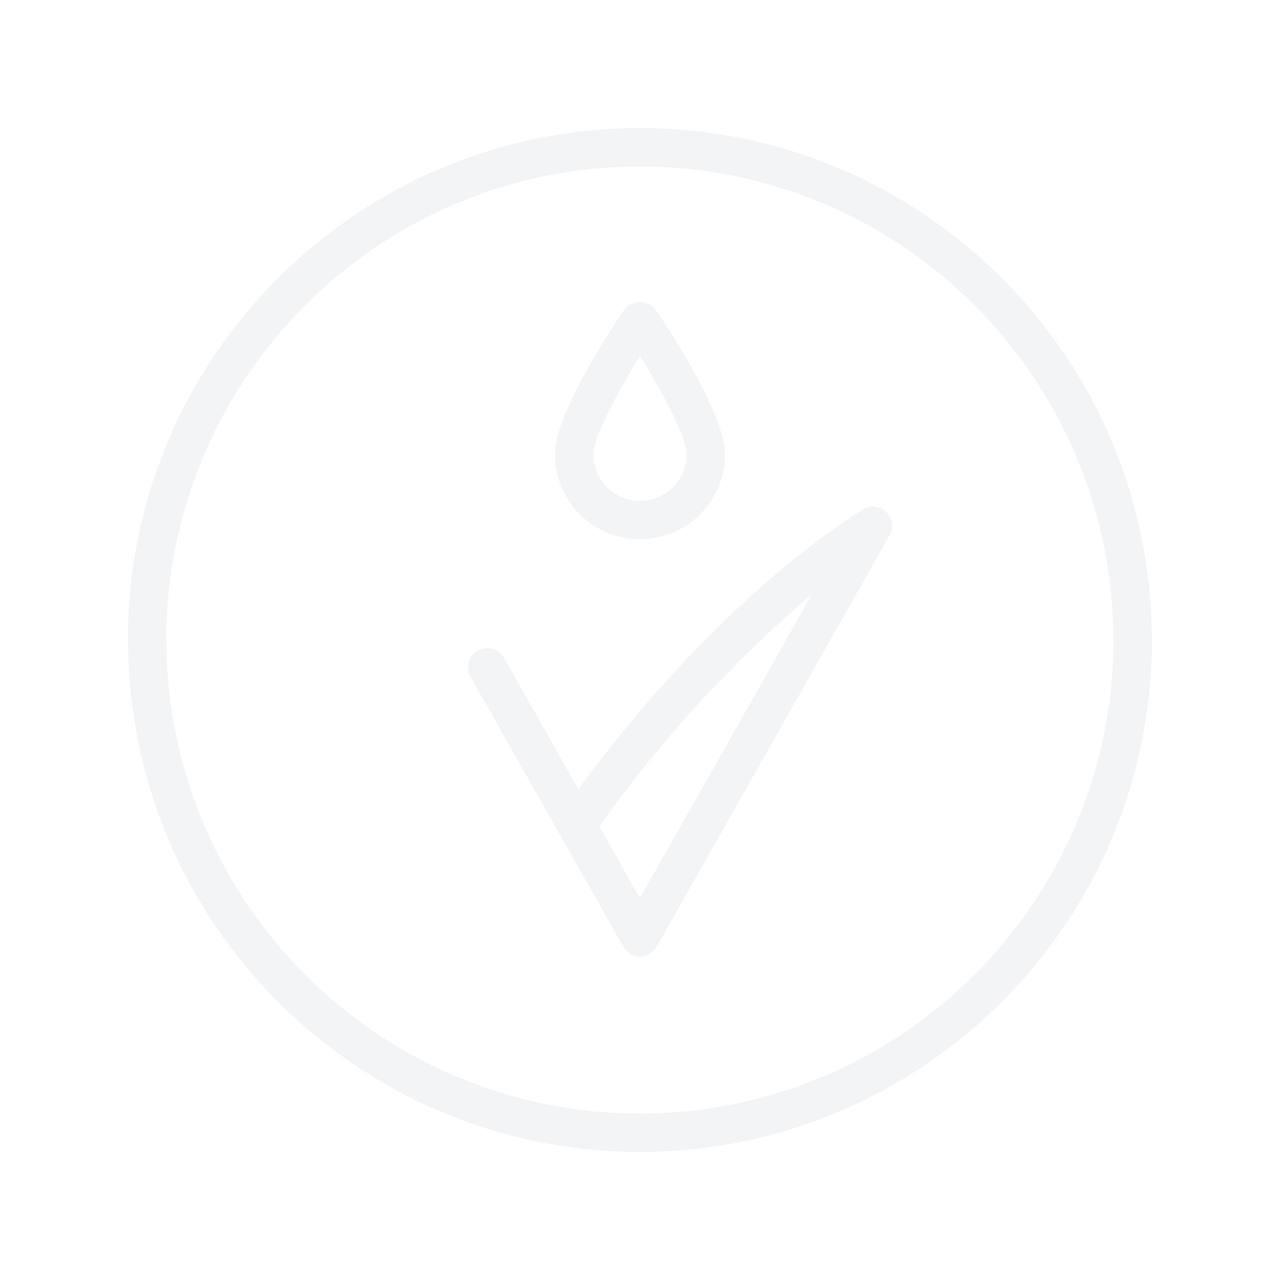 LÖWENGRIP Healthy Glow Roll-On Deodorant 50ml